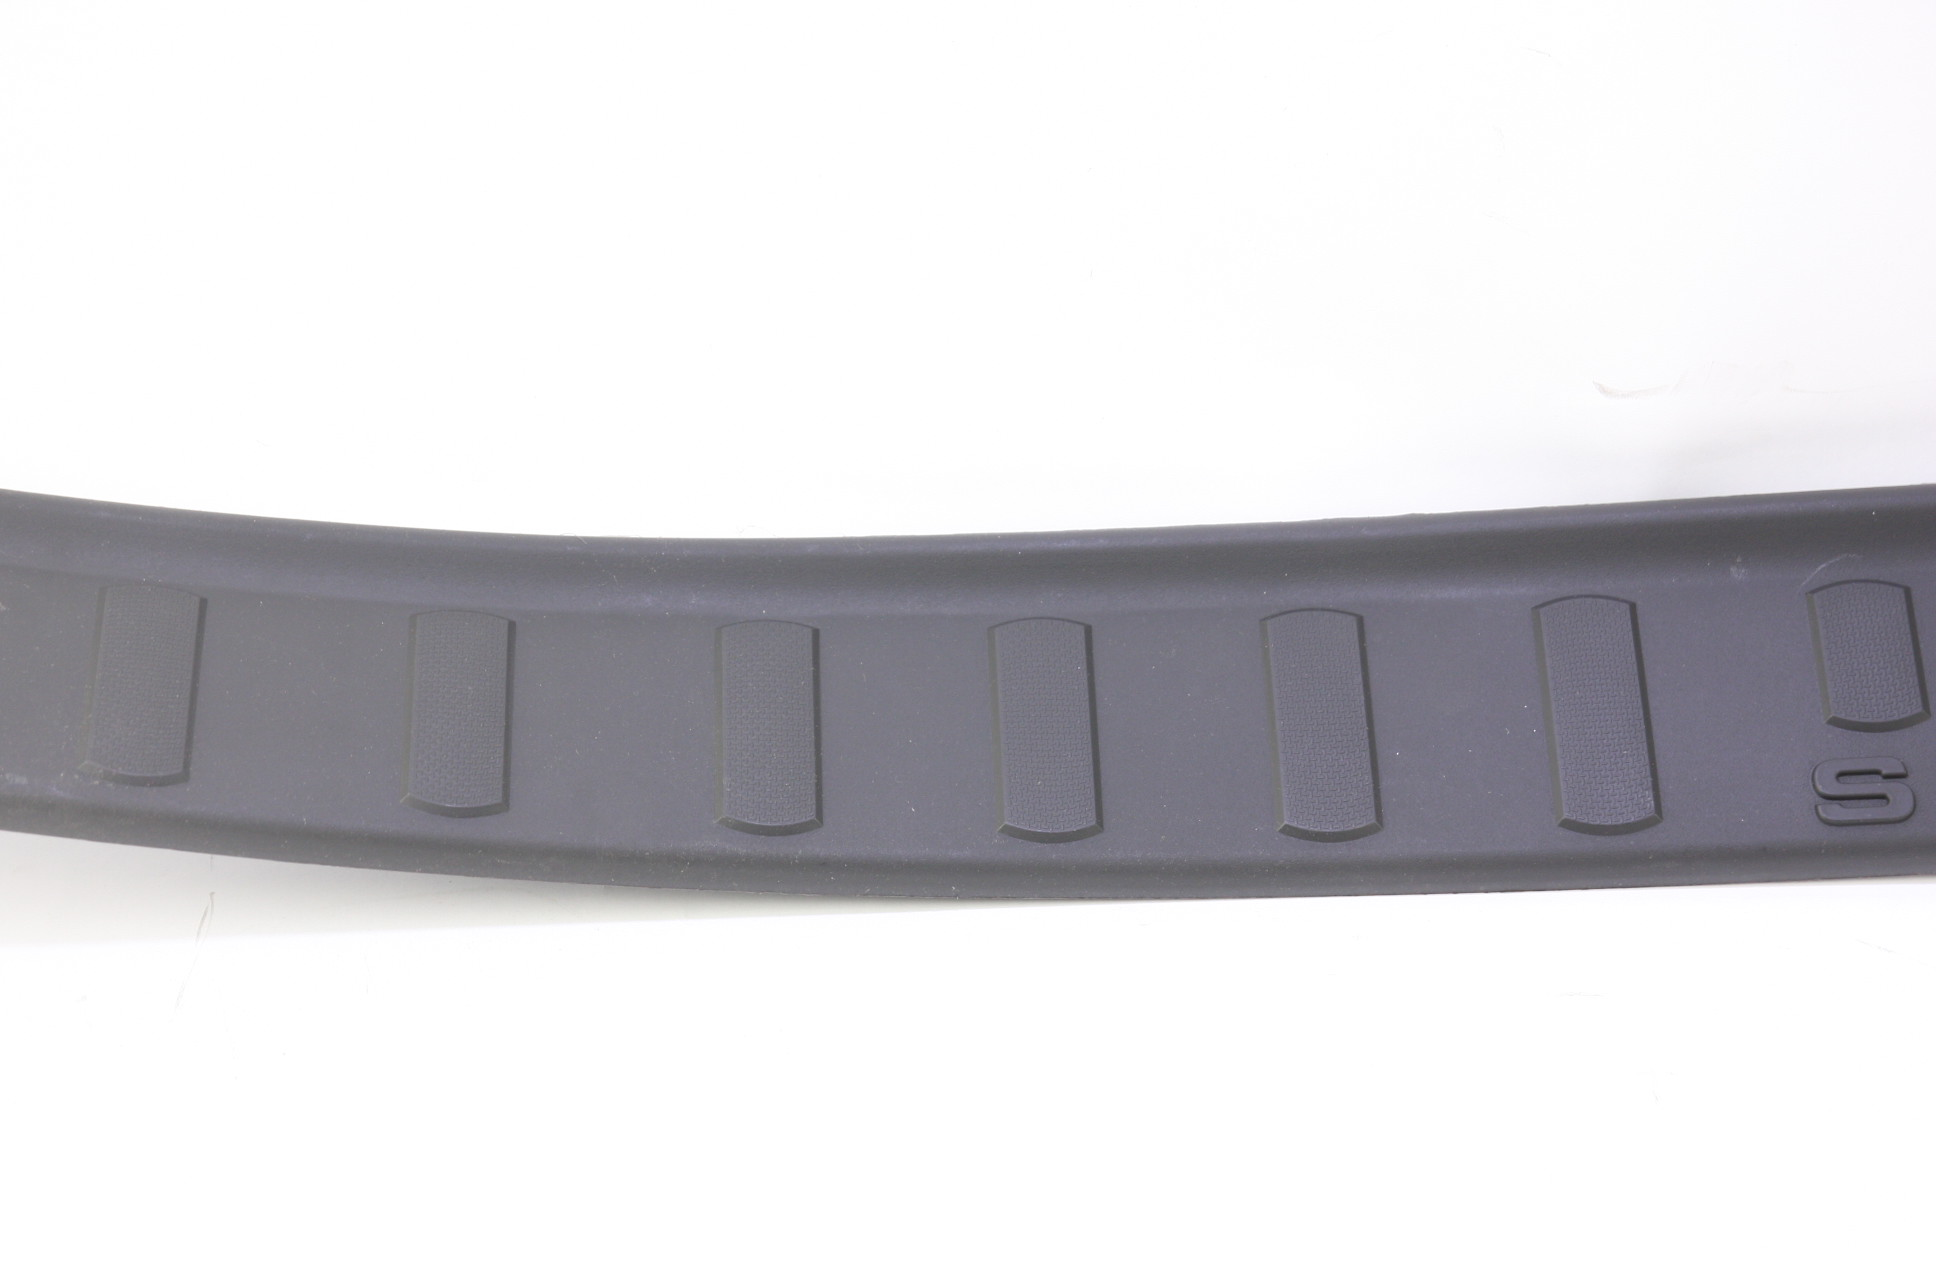 ~ New OEM 9C3Z2813208CA Ford 08-16 F-350 Super Duty Door Sill Scuff Plate RH - image 3